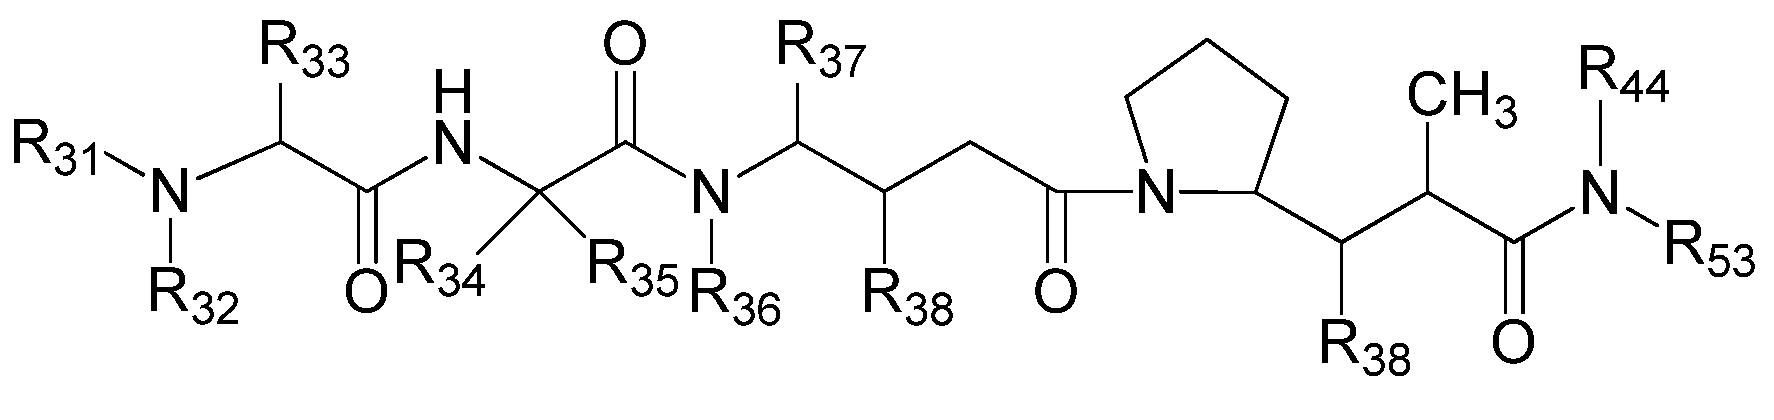 Figure 112014001971018-pct00108